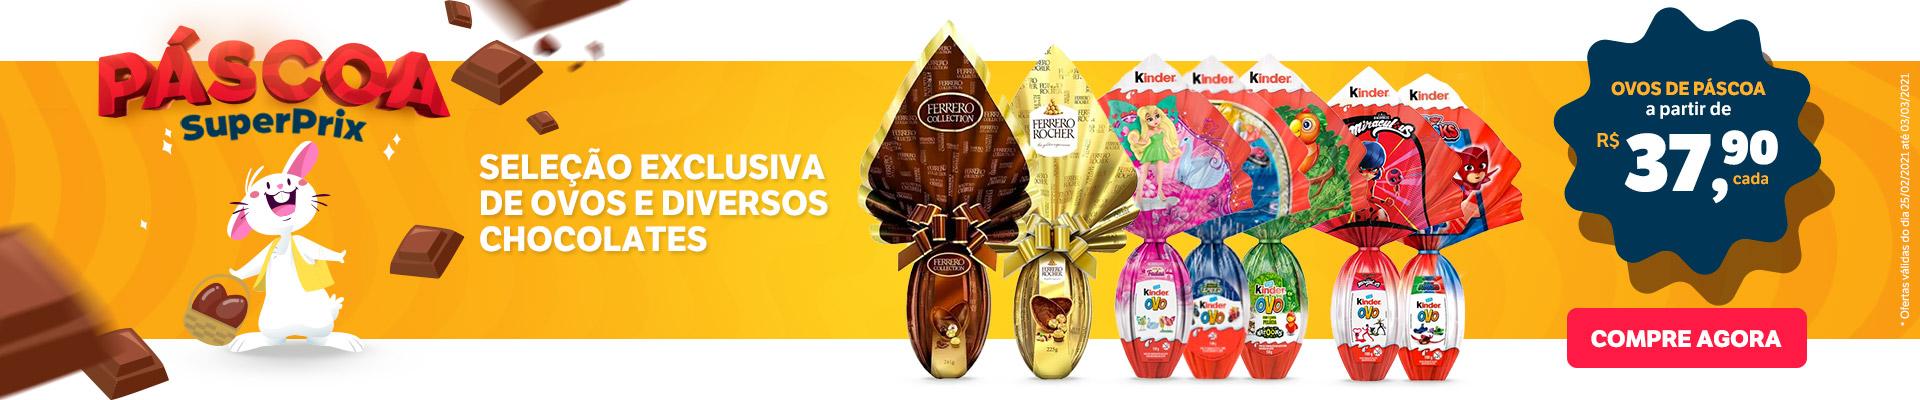 LANCHES FRESQUINHOS / Páscoa